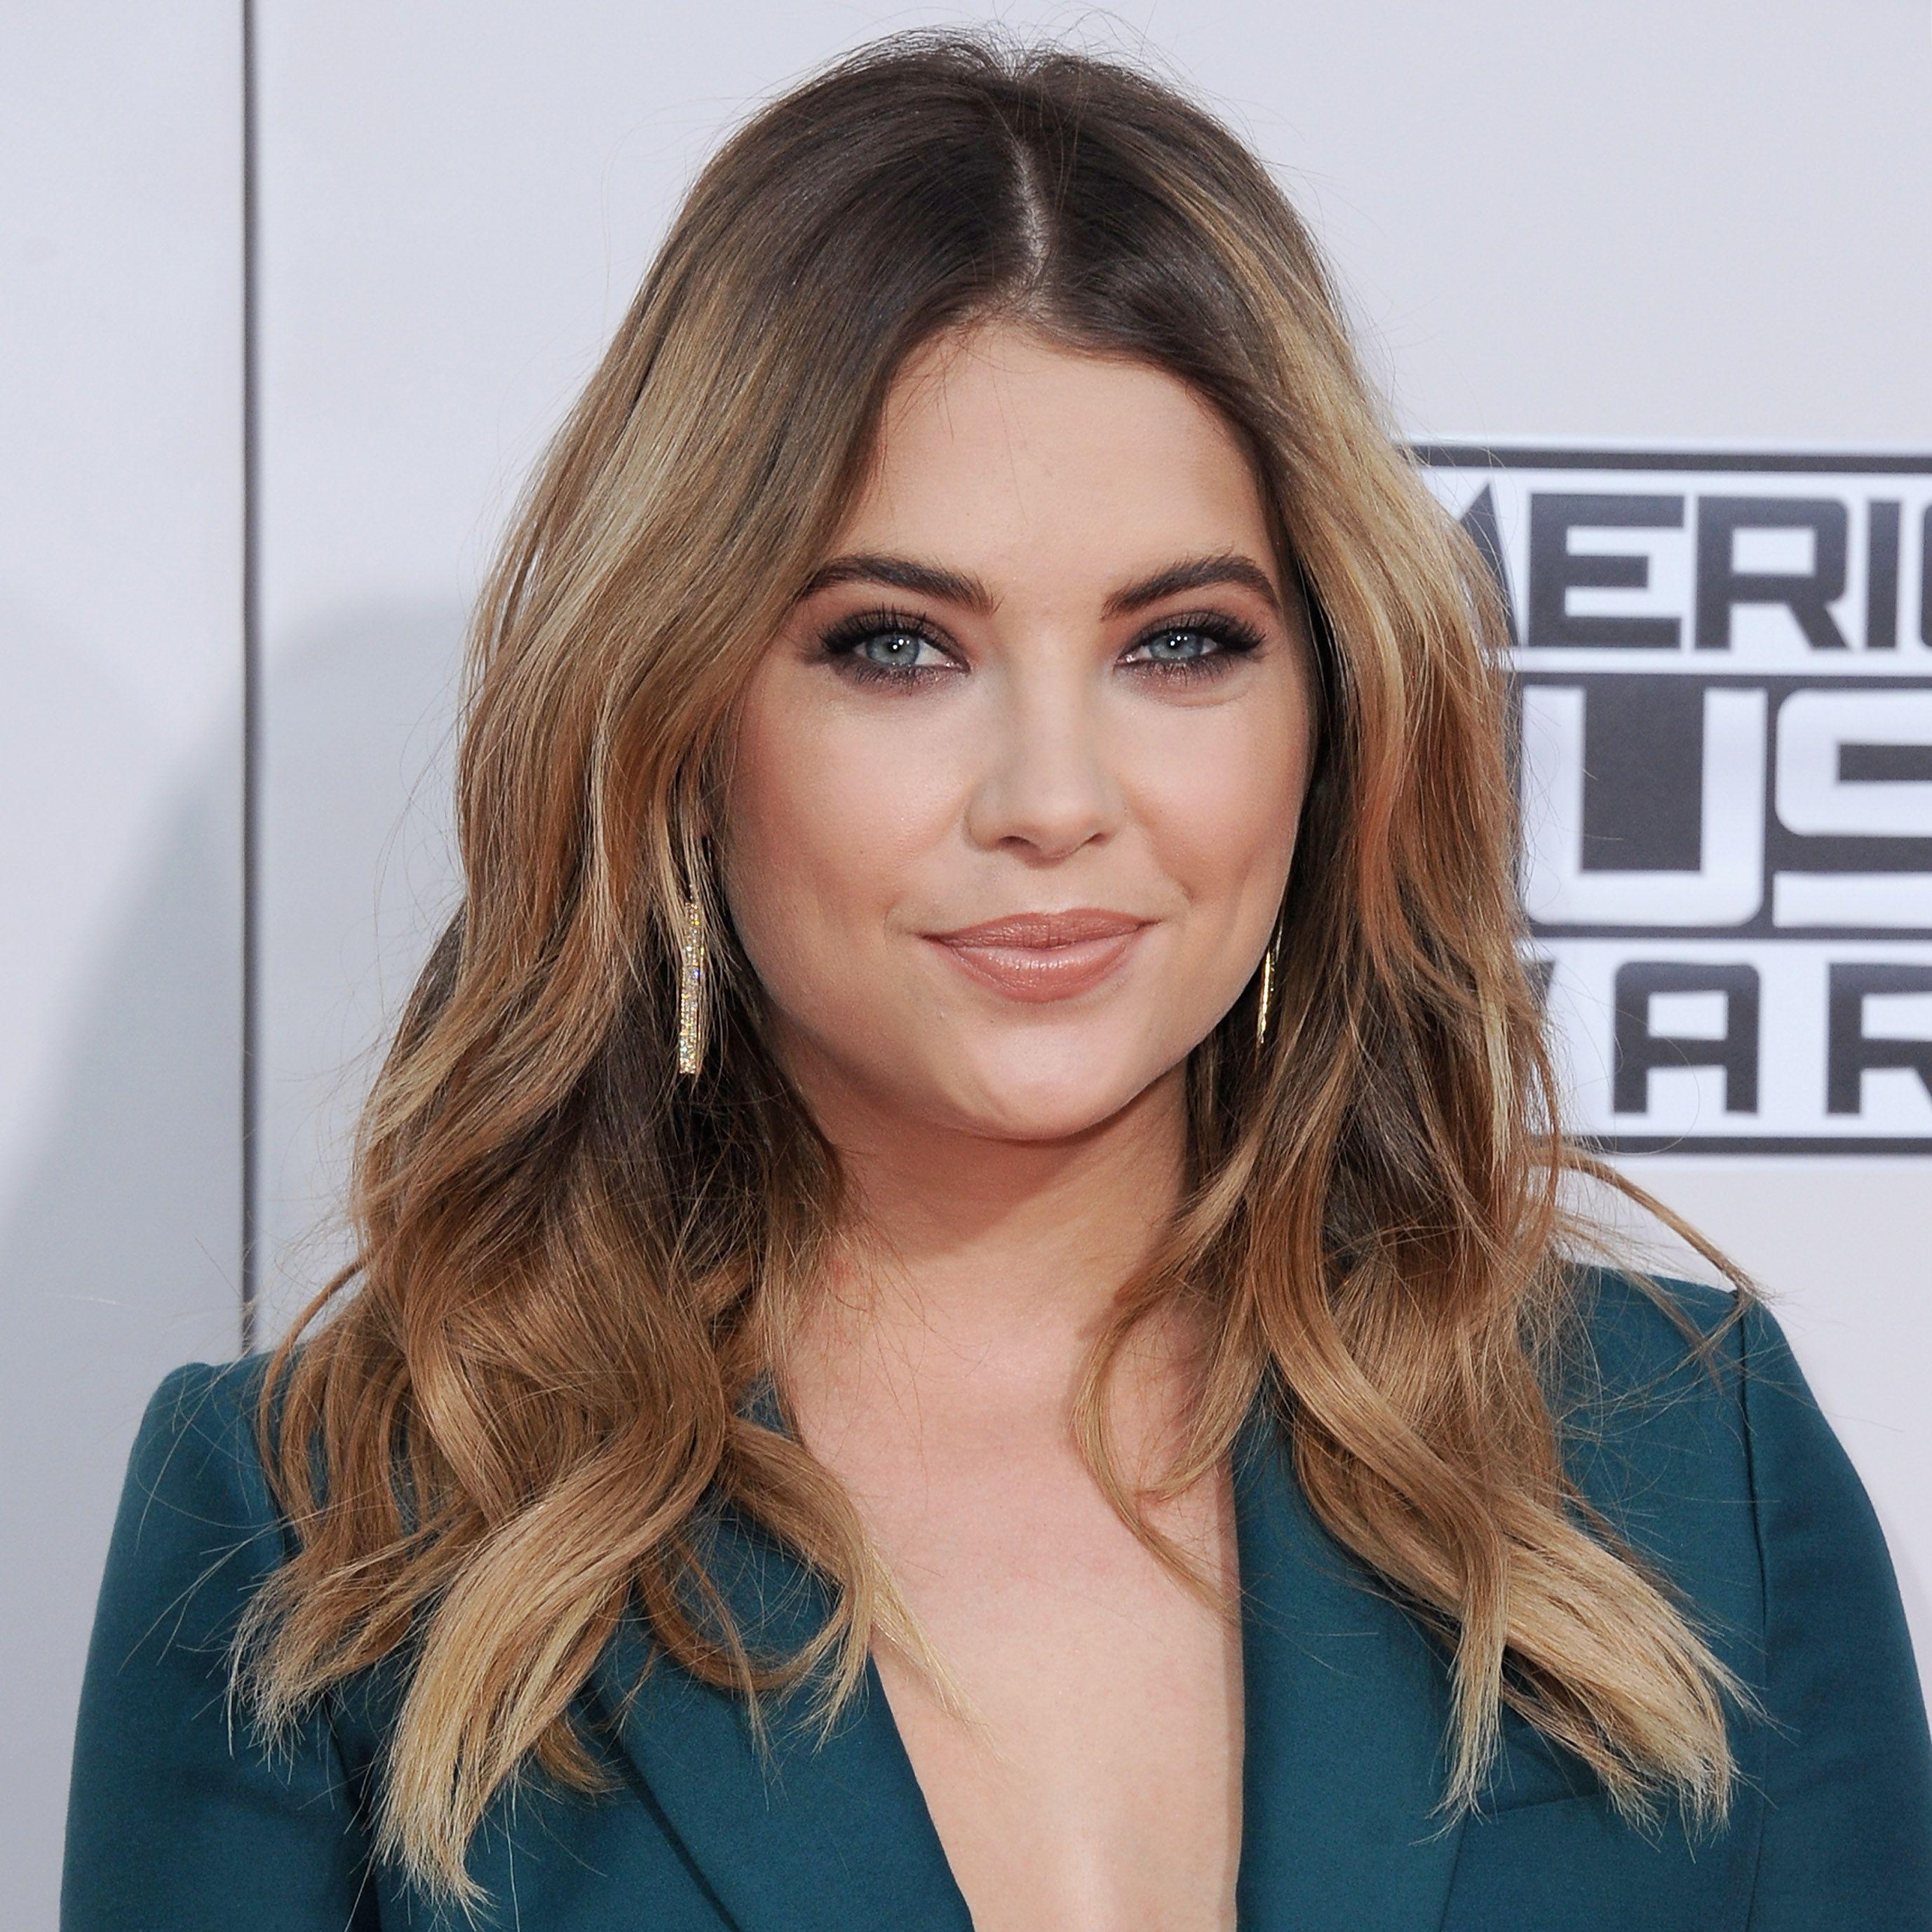 American Music Awards 2015 beauty looks